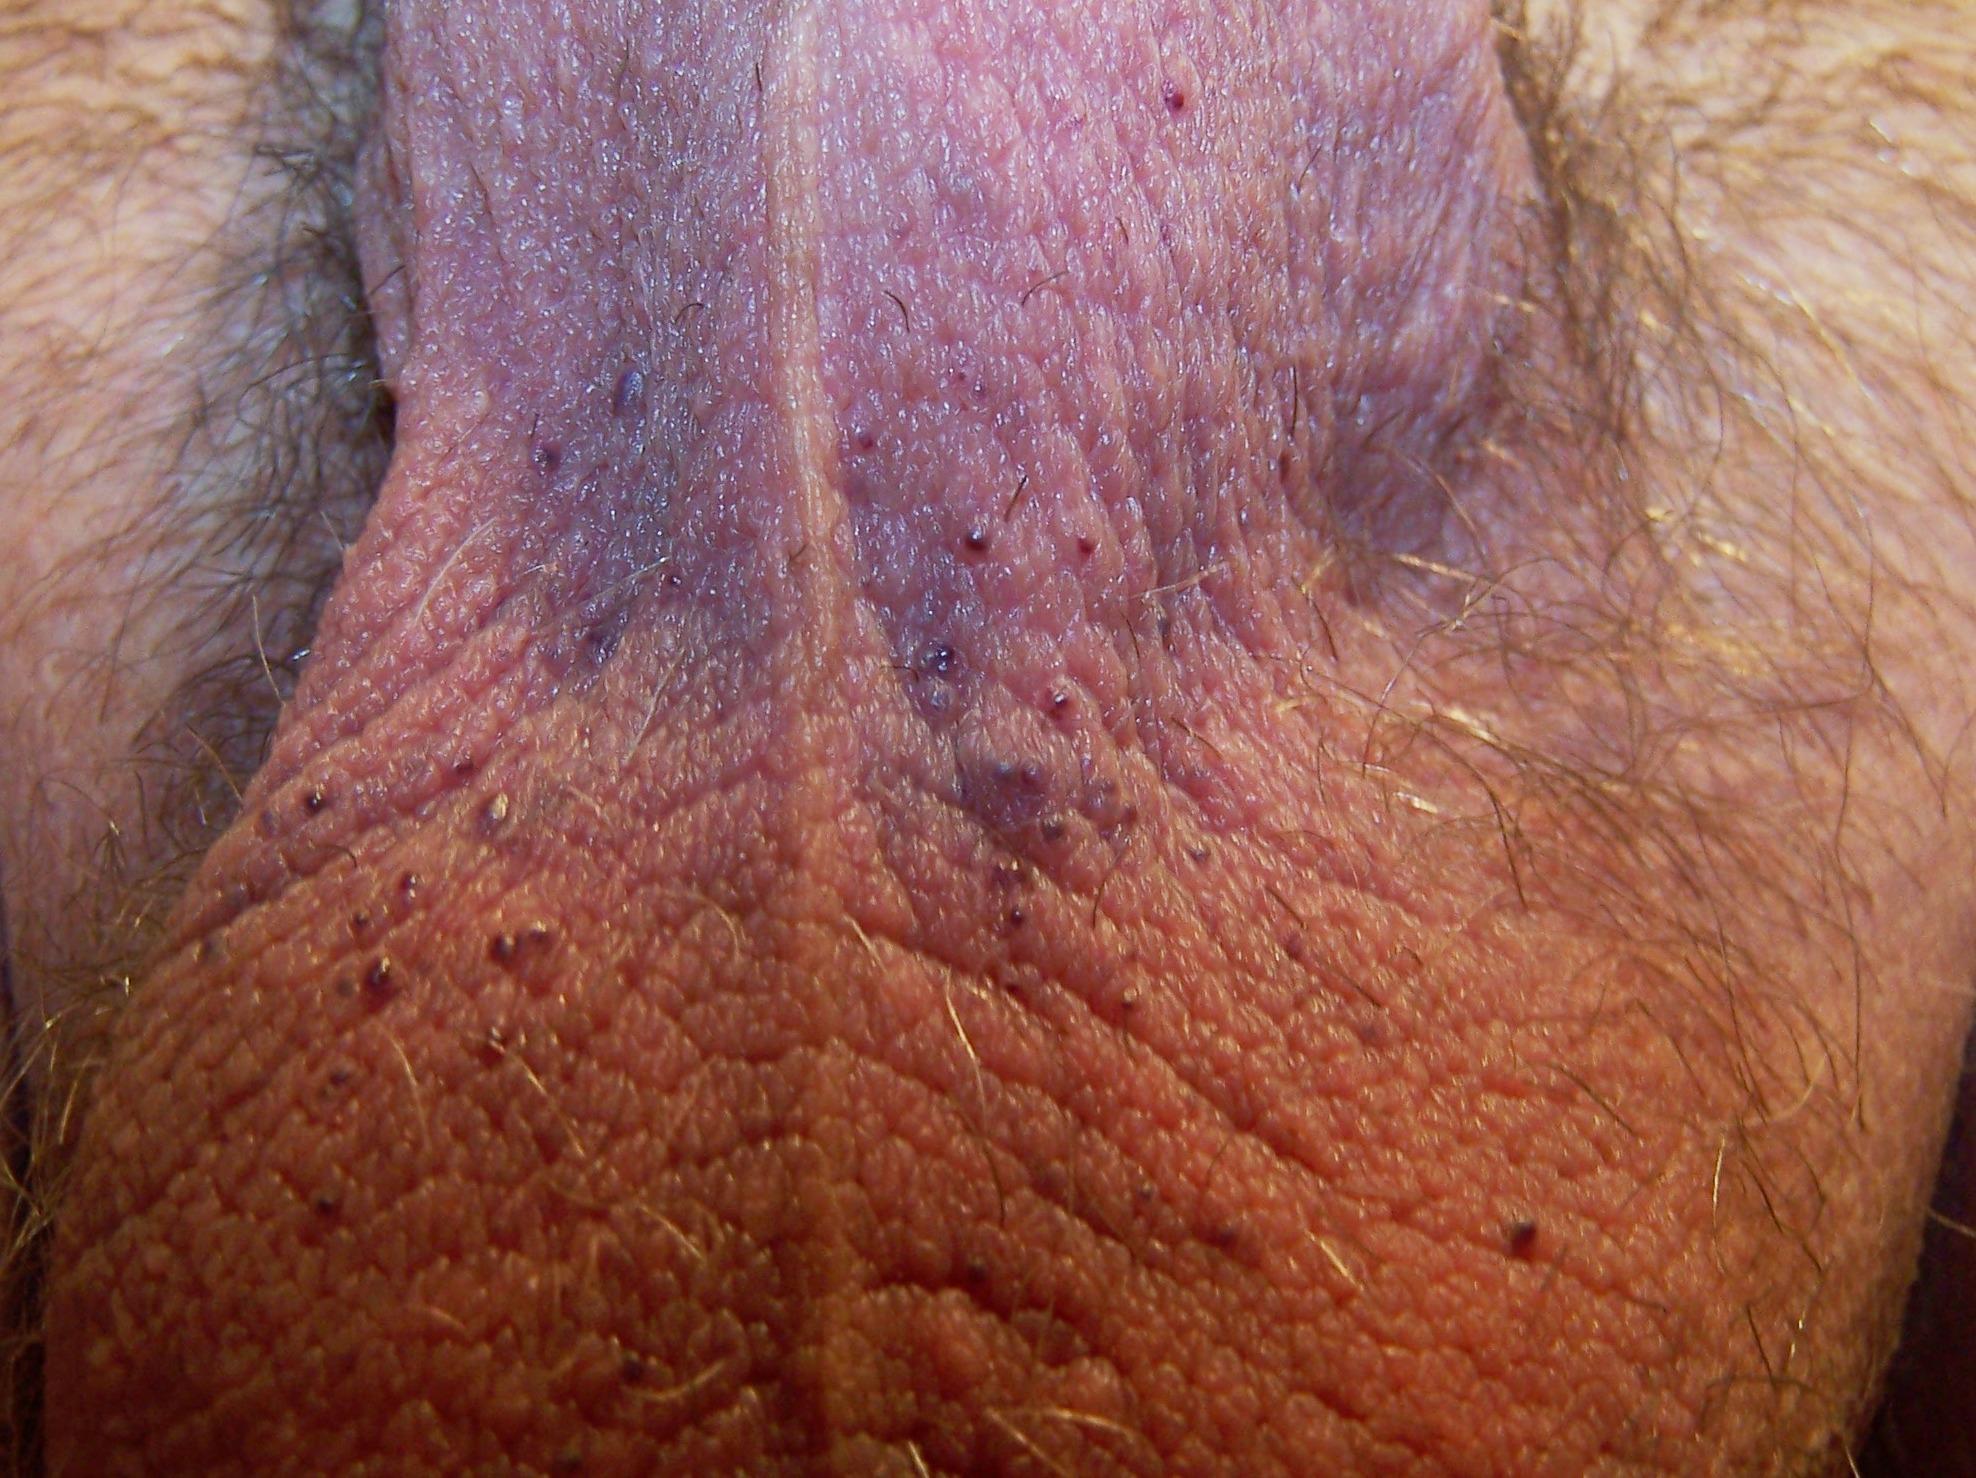 angiokeratoma scrotum